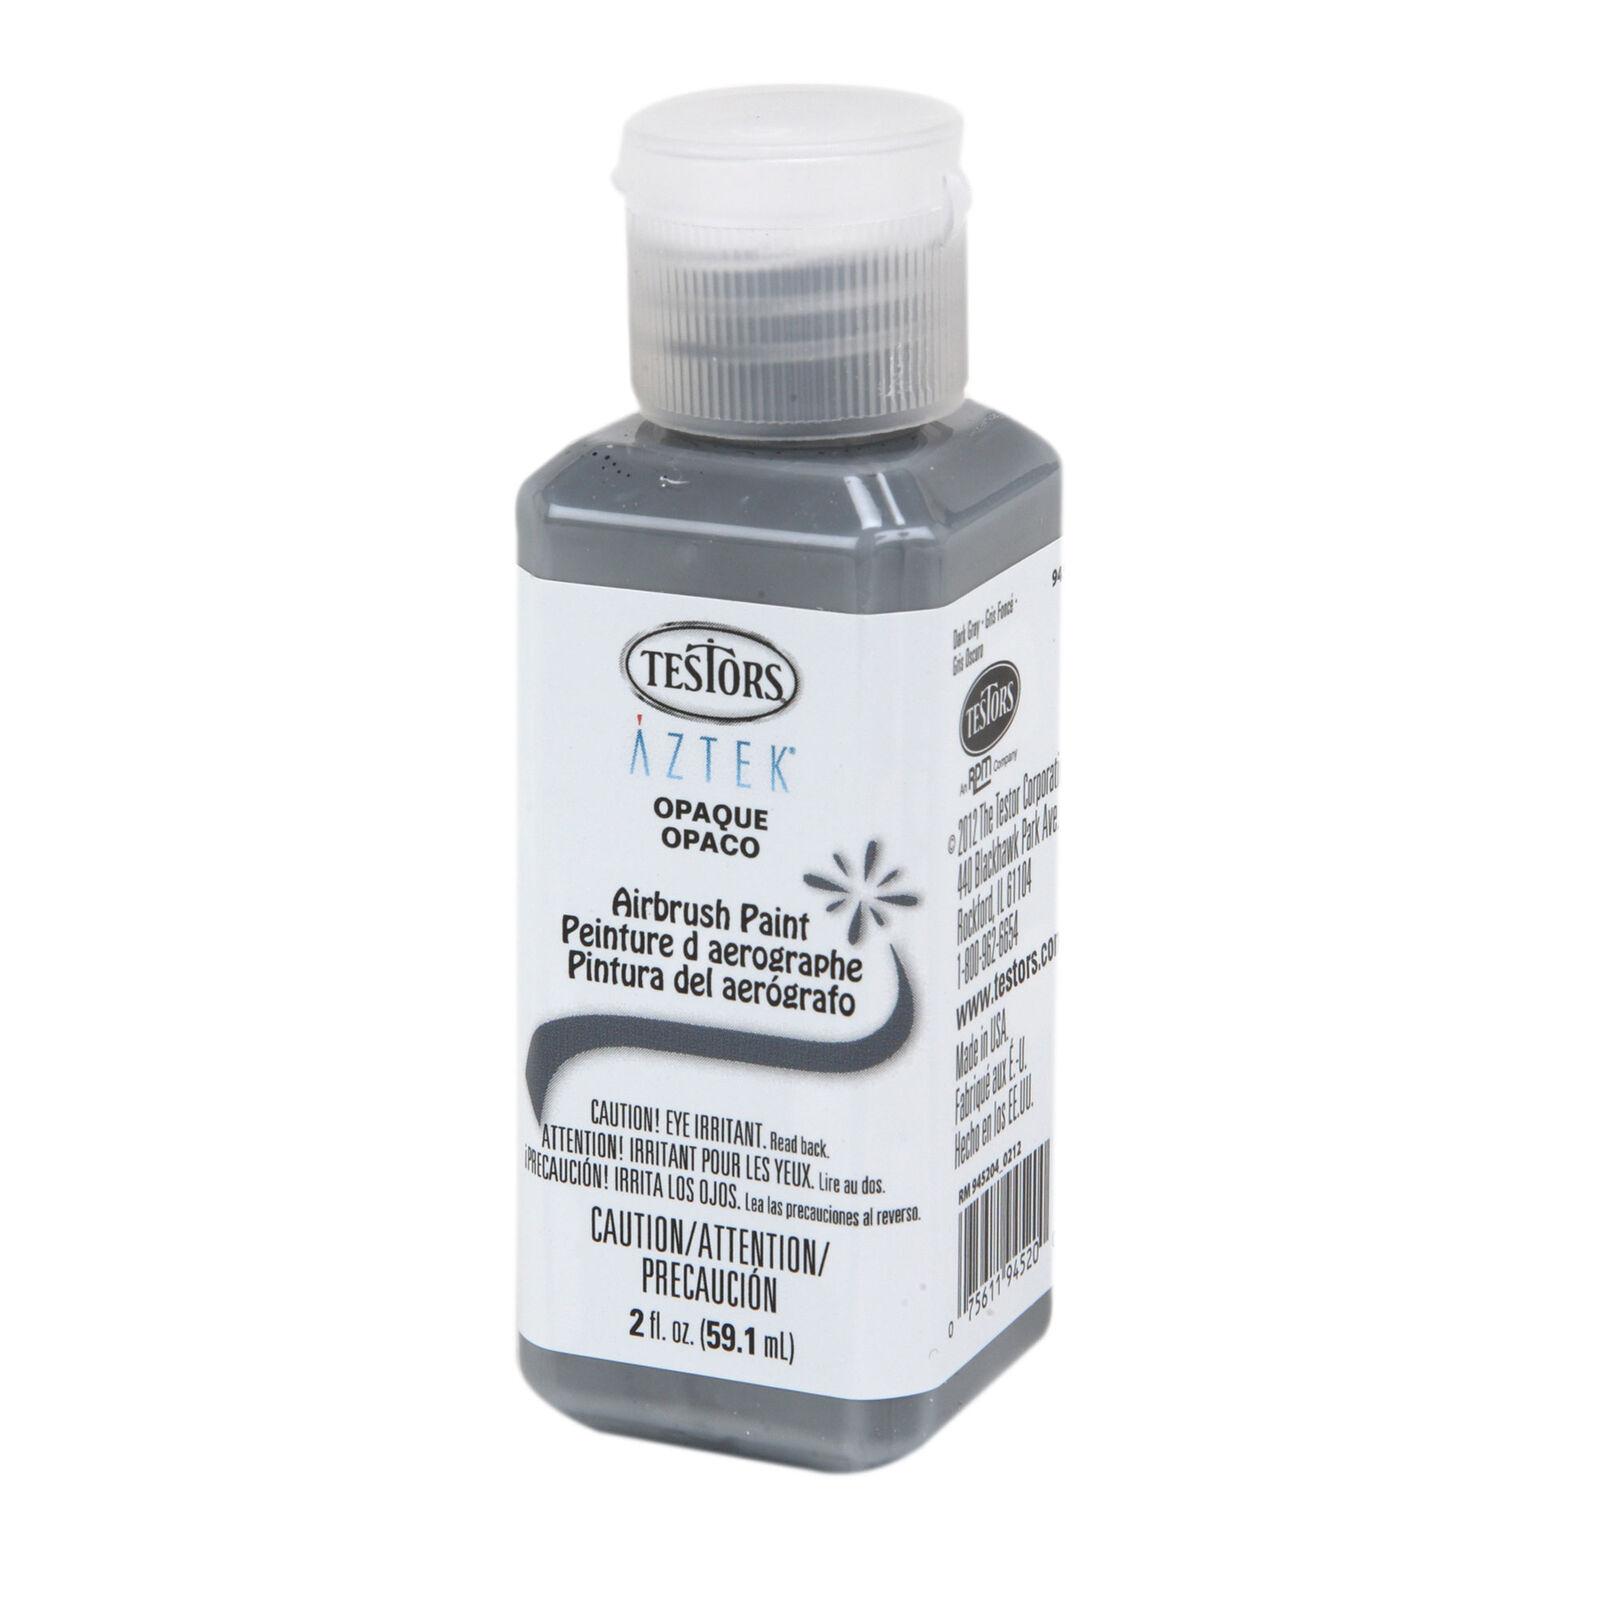 Aztek Airbrush Paint, Opaque Dark Gray Acrylic, 2 oz.